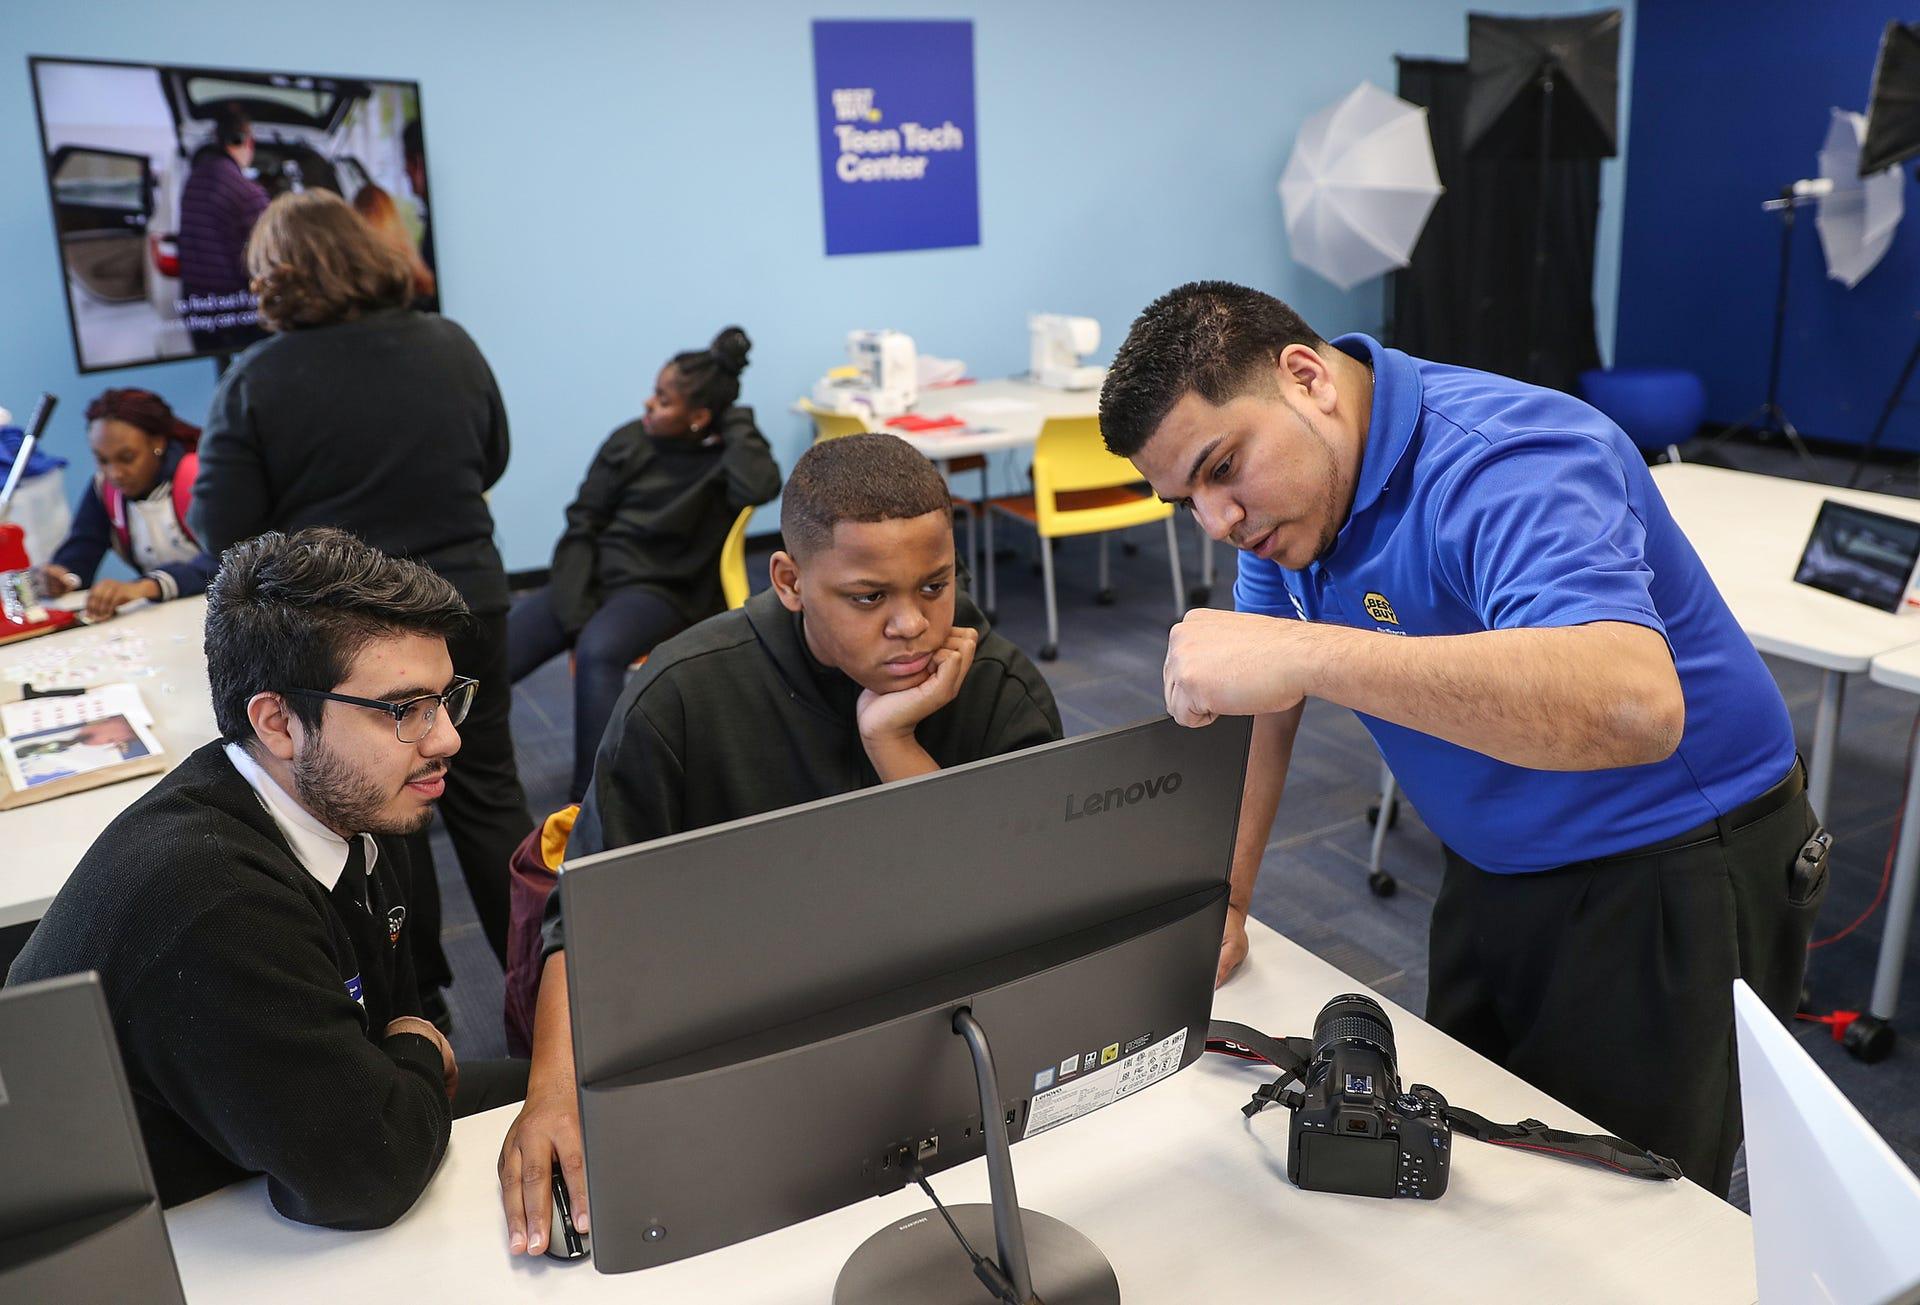 Carlos Bucio, left, and Yass Fernandez, right, teach photoshop skills to  Damon